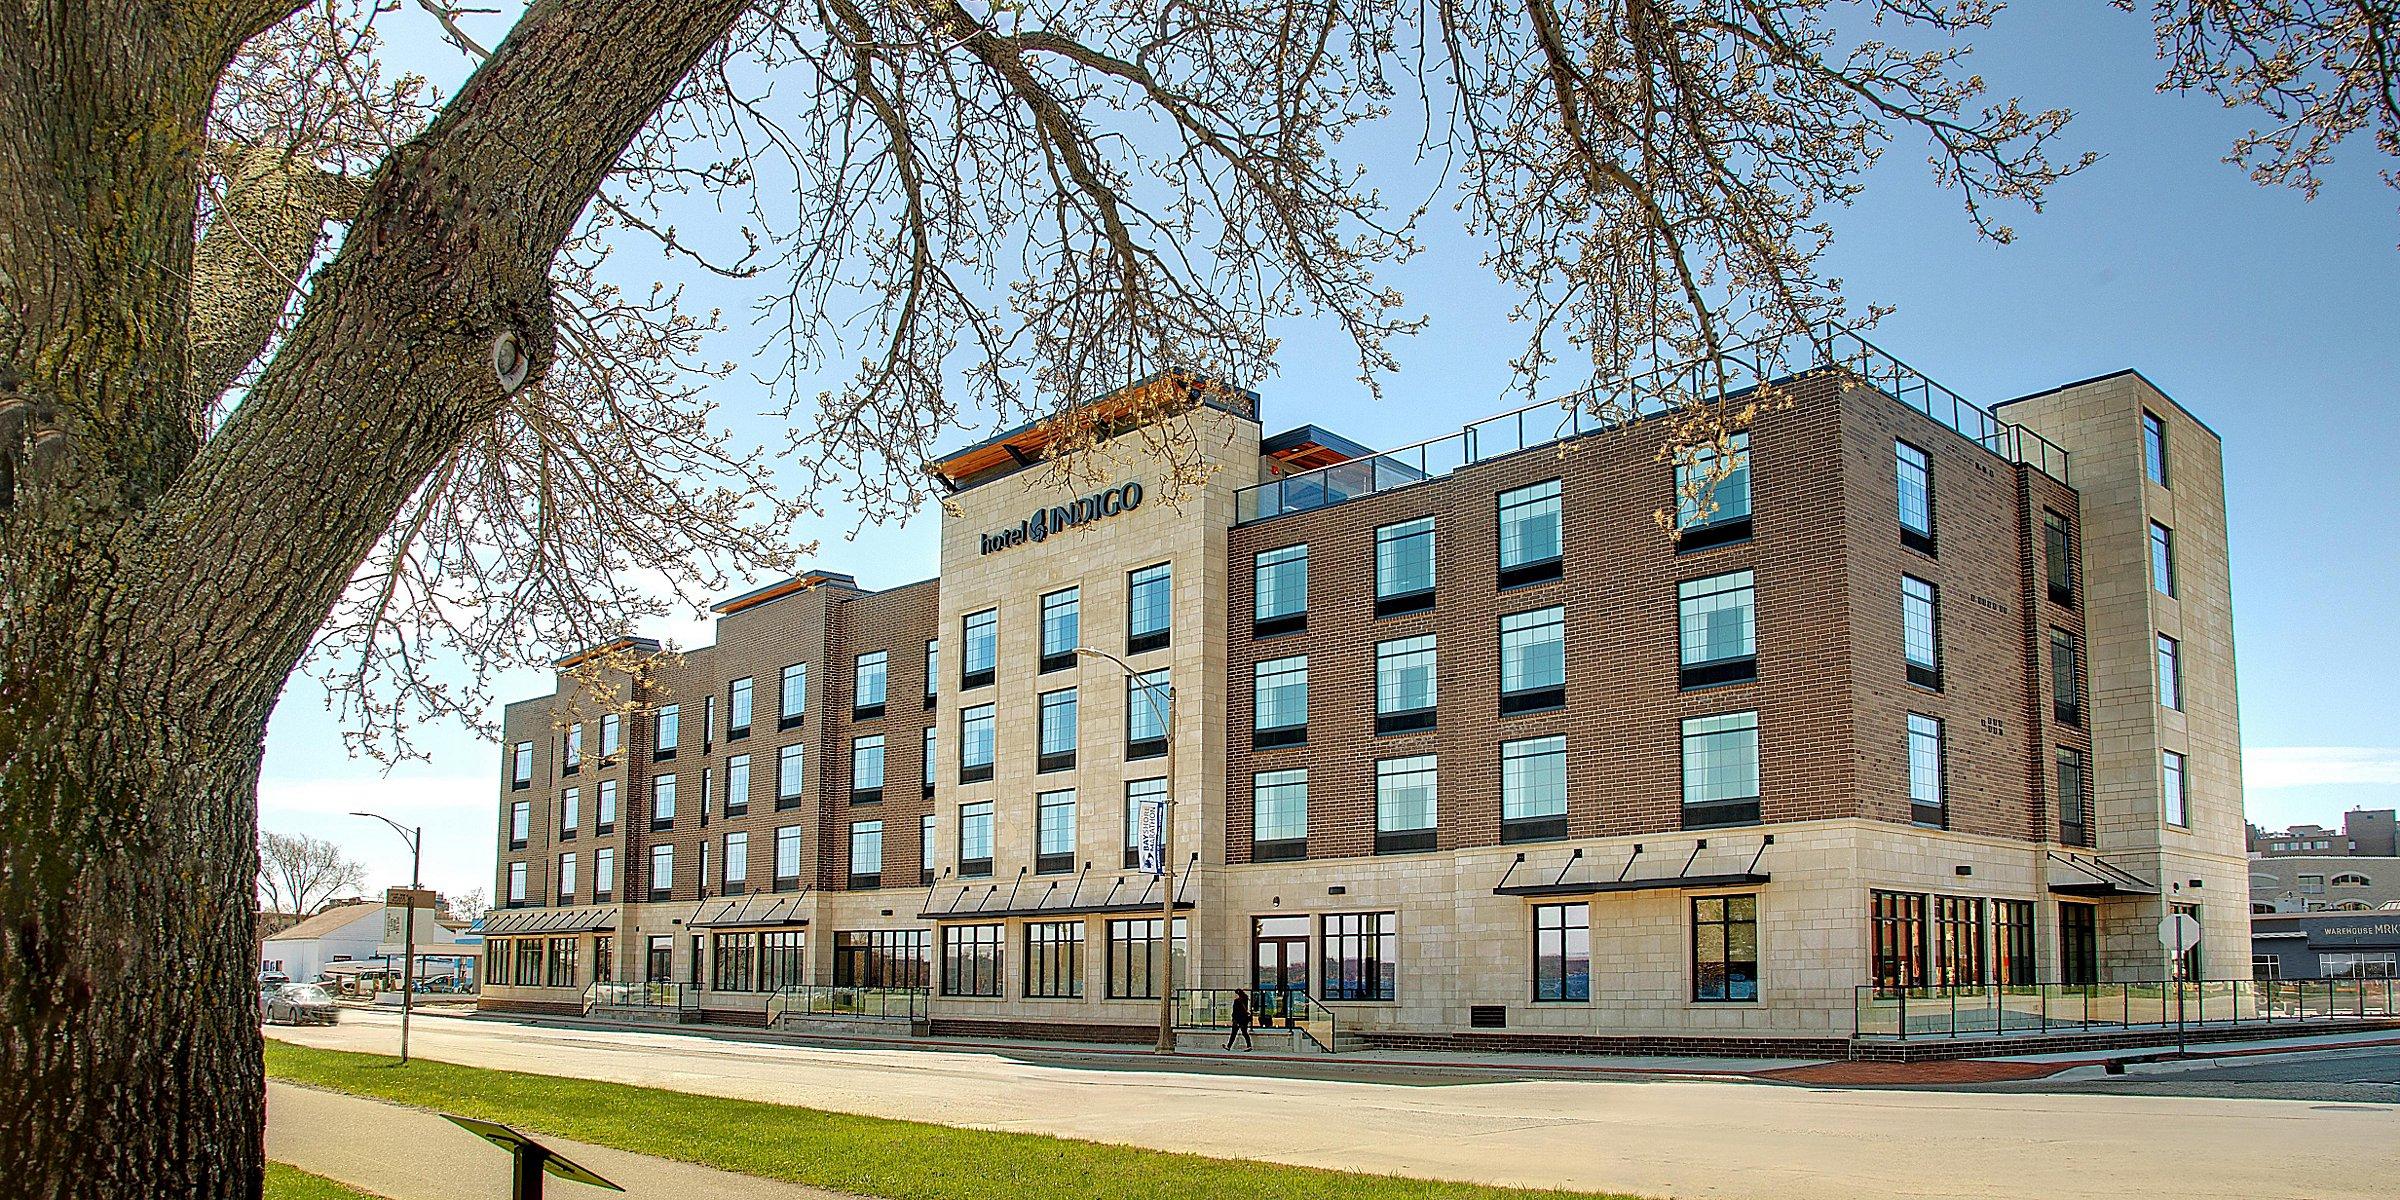 Traverse City Hotels: Hotel Indigo Traverse City Hotel in ...